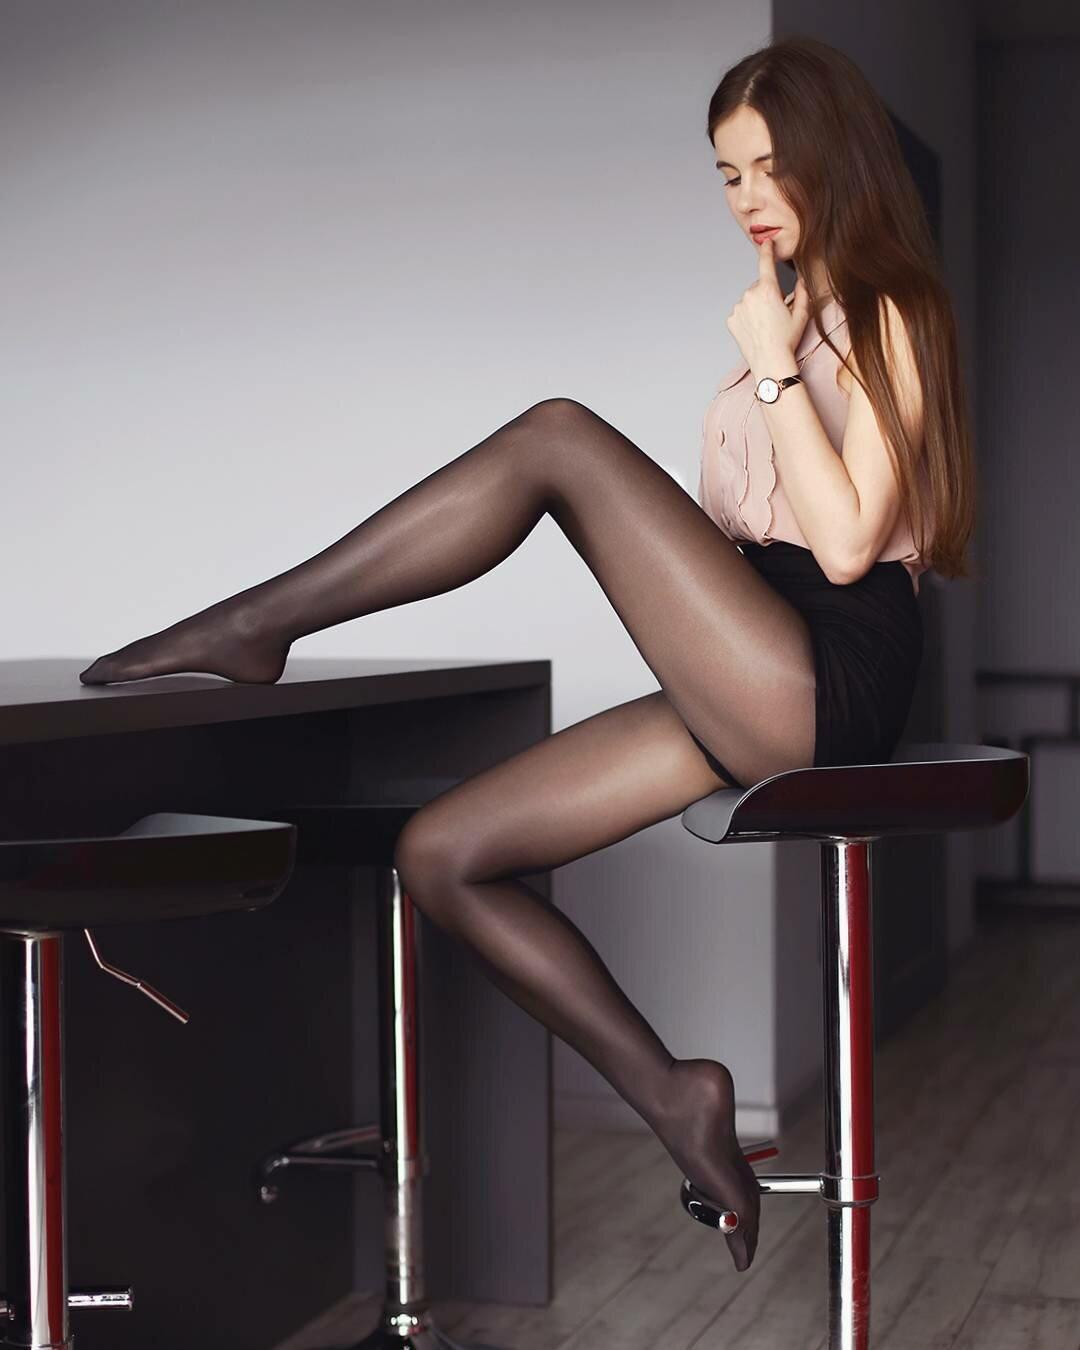 фотосет ножки в колготках чулках